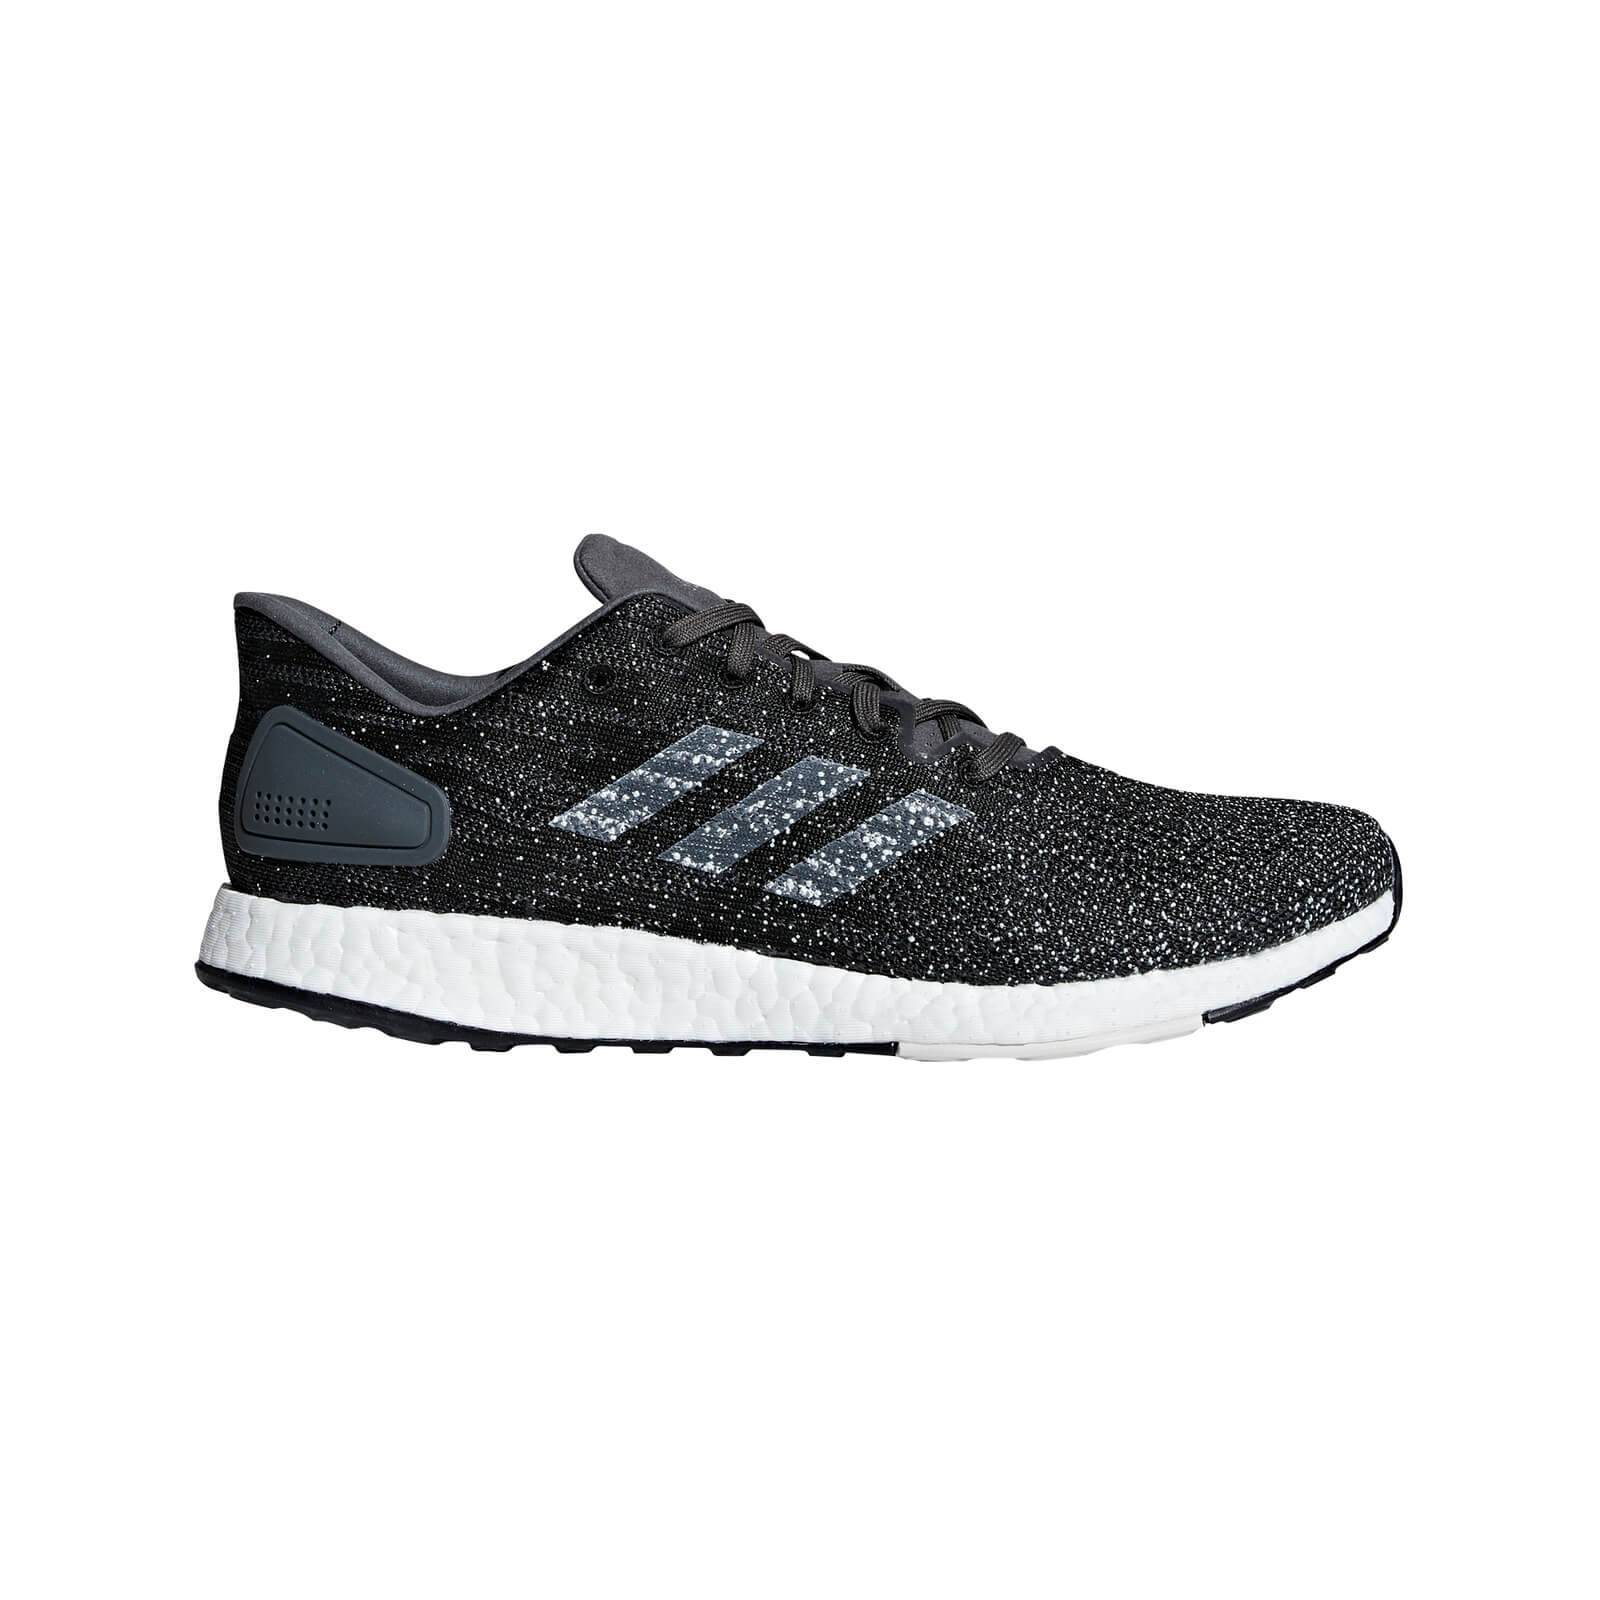 adidas Men's Pure Boost DPR Running Shoes - Grey Six - US 9/UK 8.5 - Grey